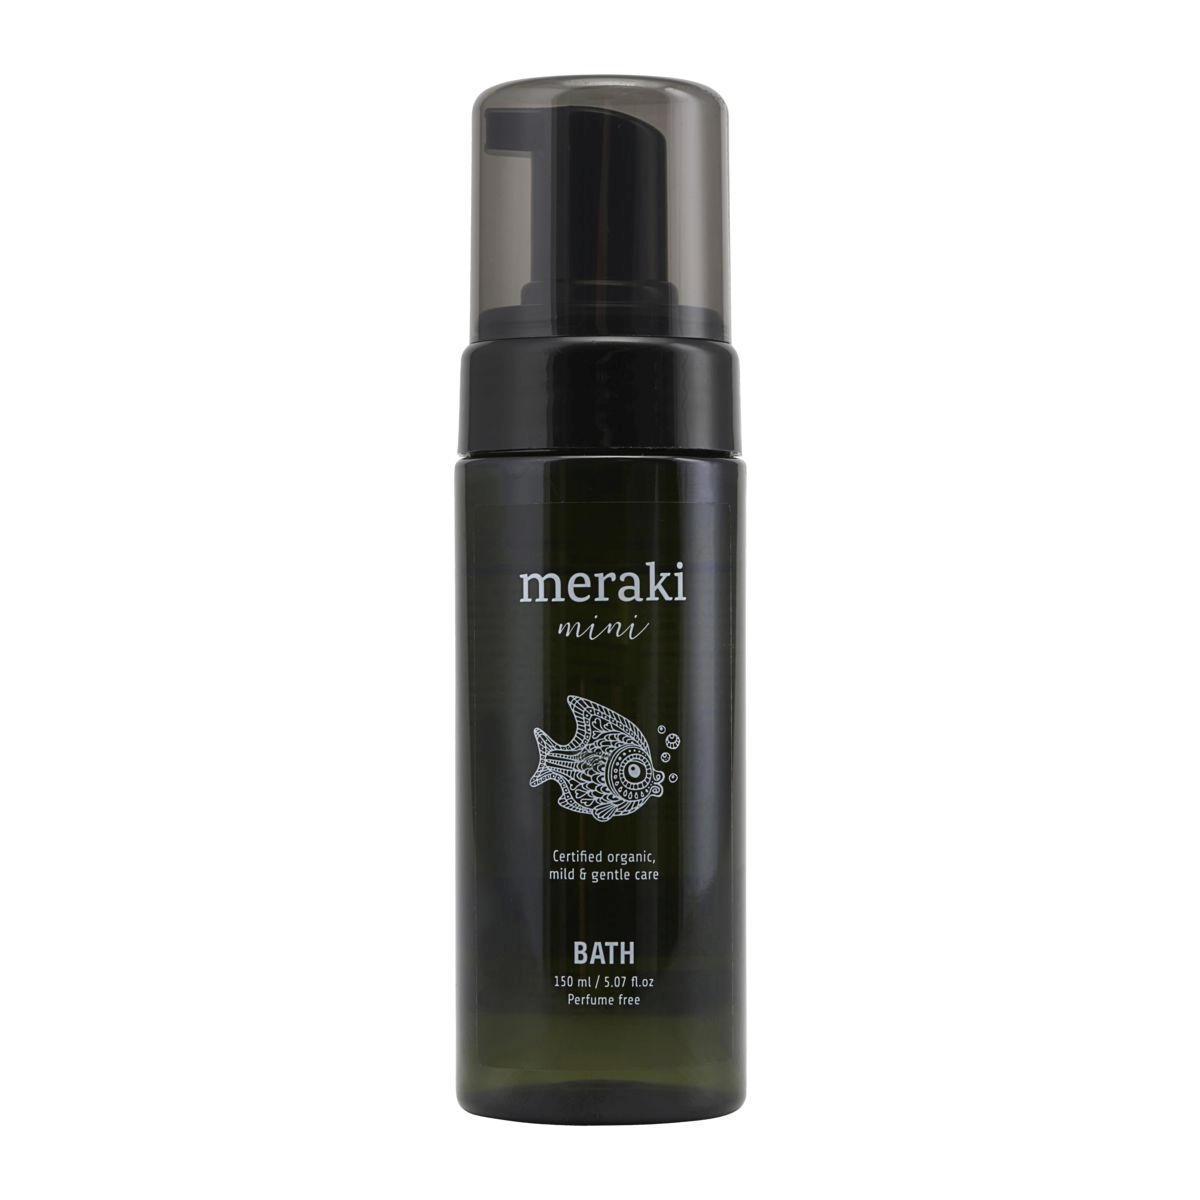 meraki Dětské tekuté mýdlo Meraki mini 150 ml, zelená barva, plast